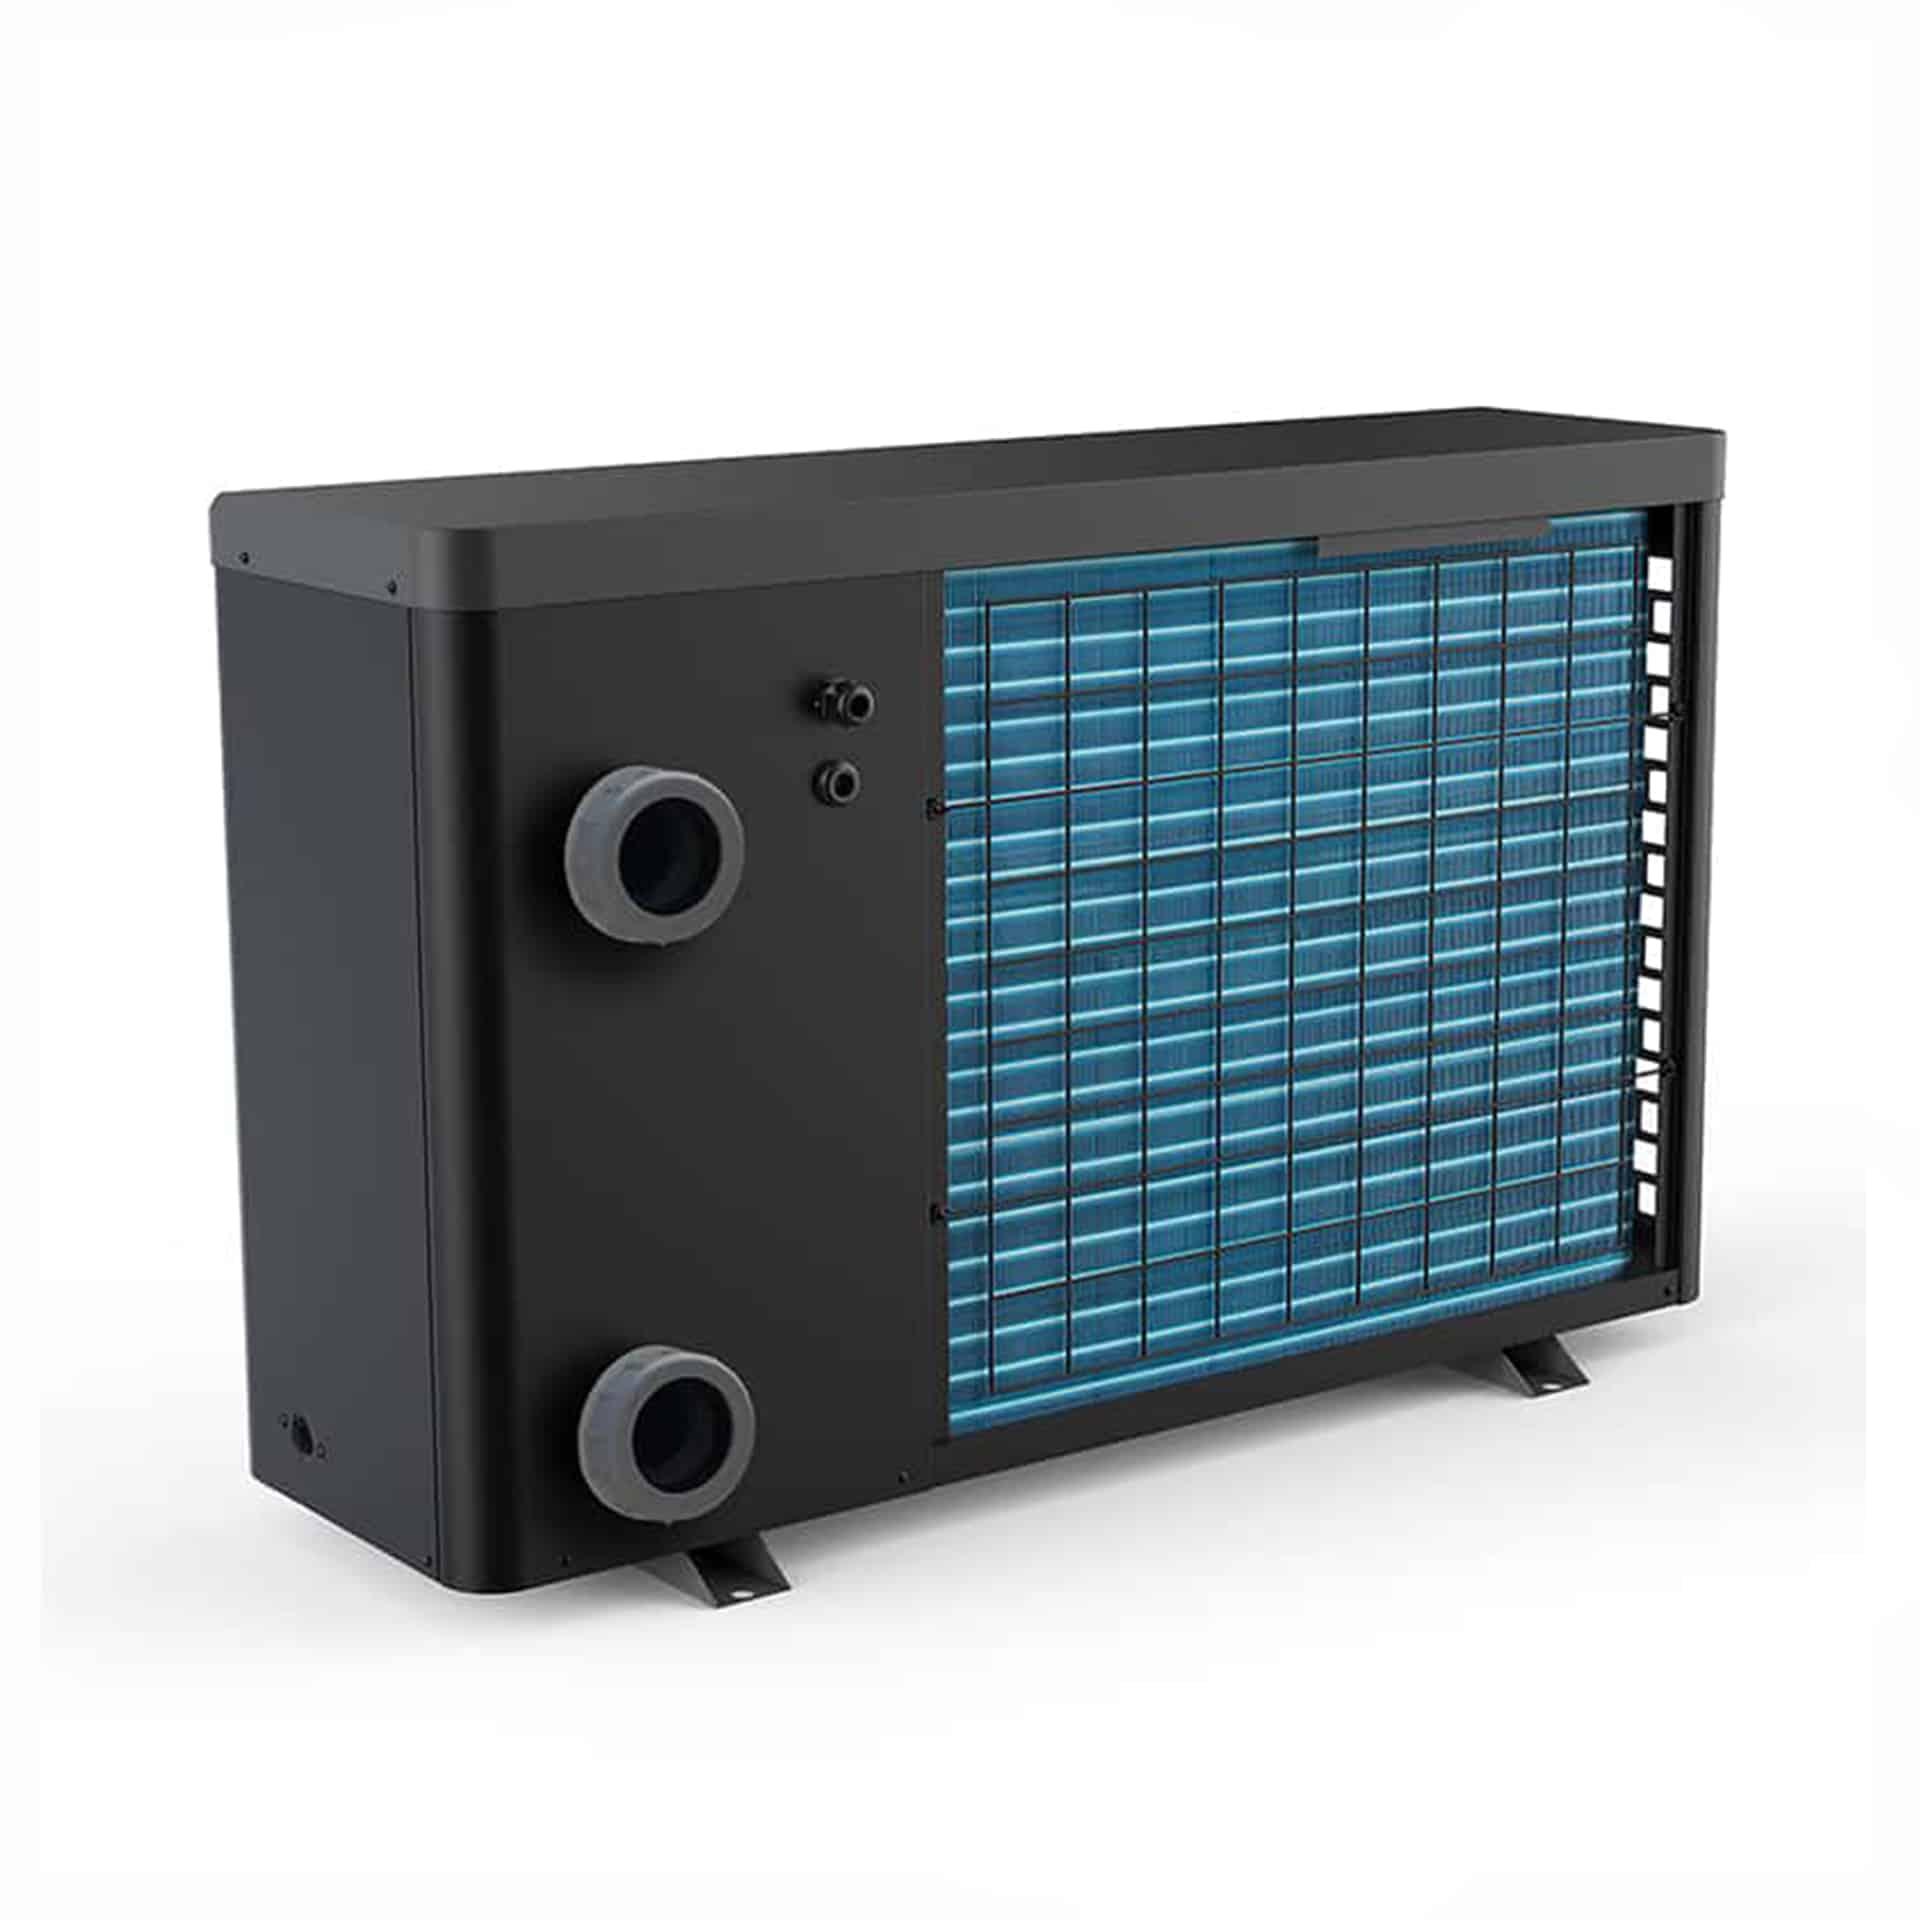 HeatBooster Pro Varmepumpe med WiFi 16 KW bakside